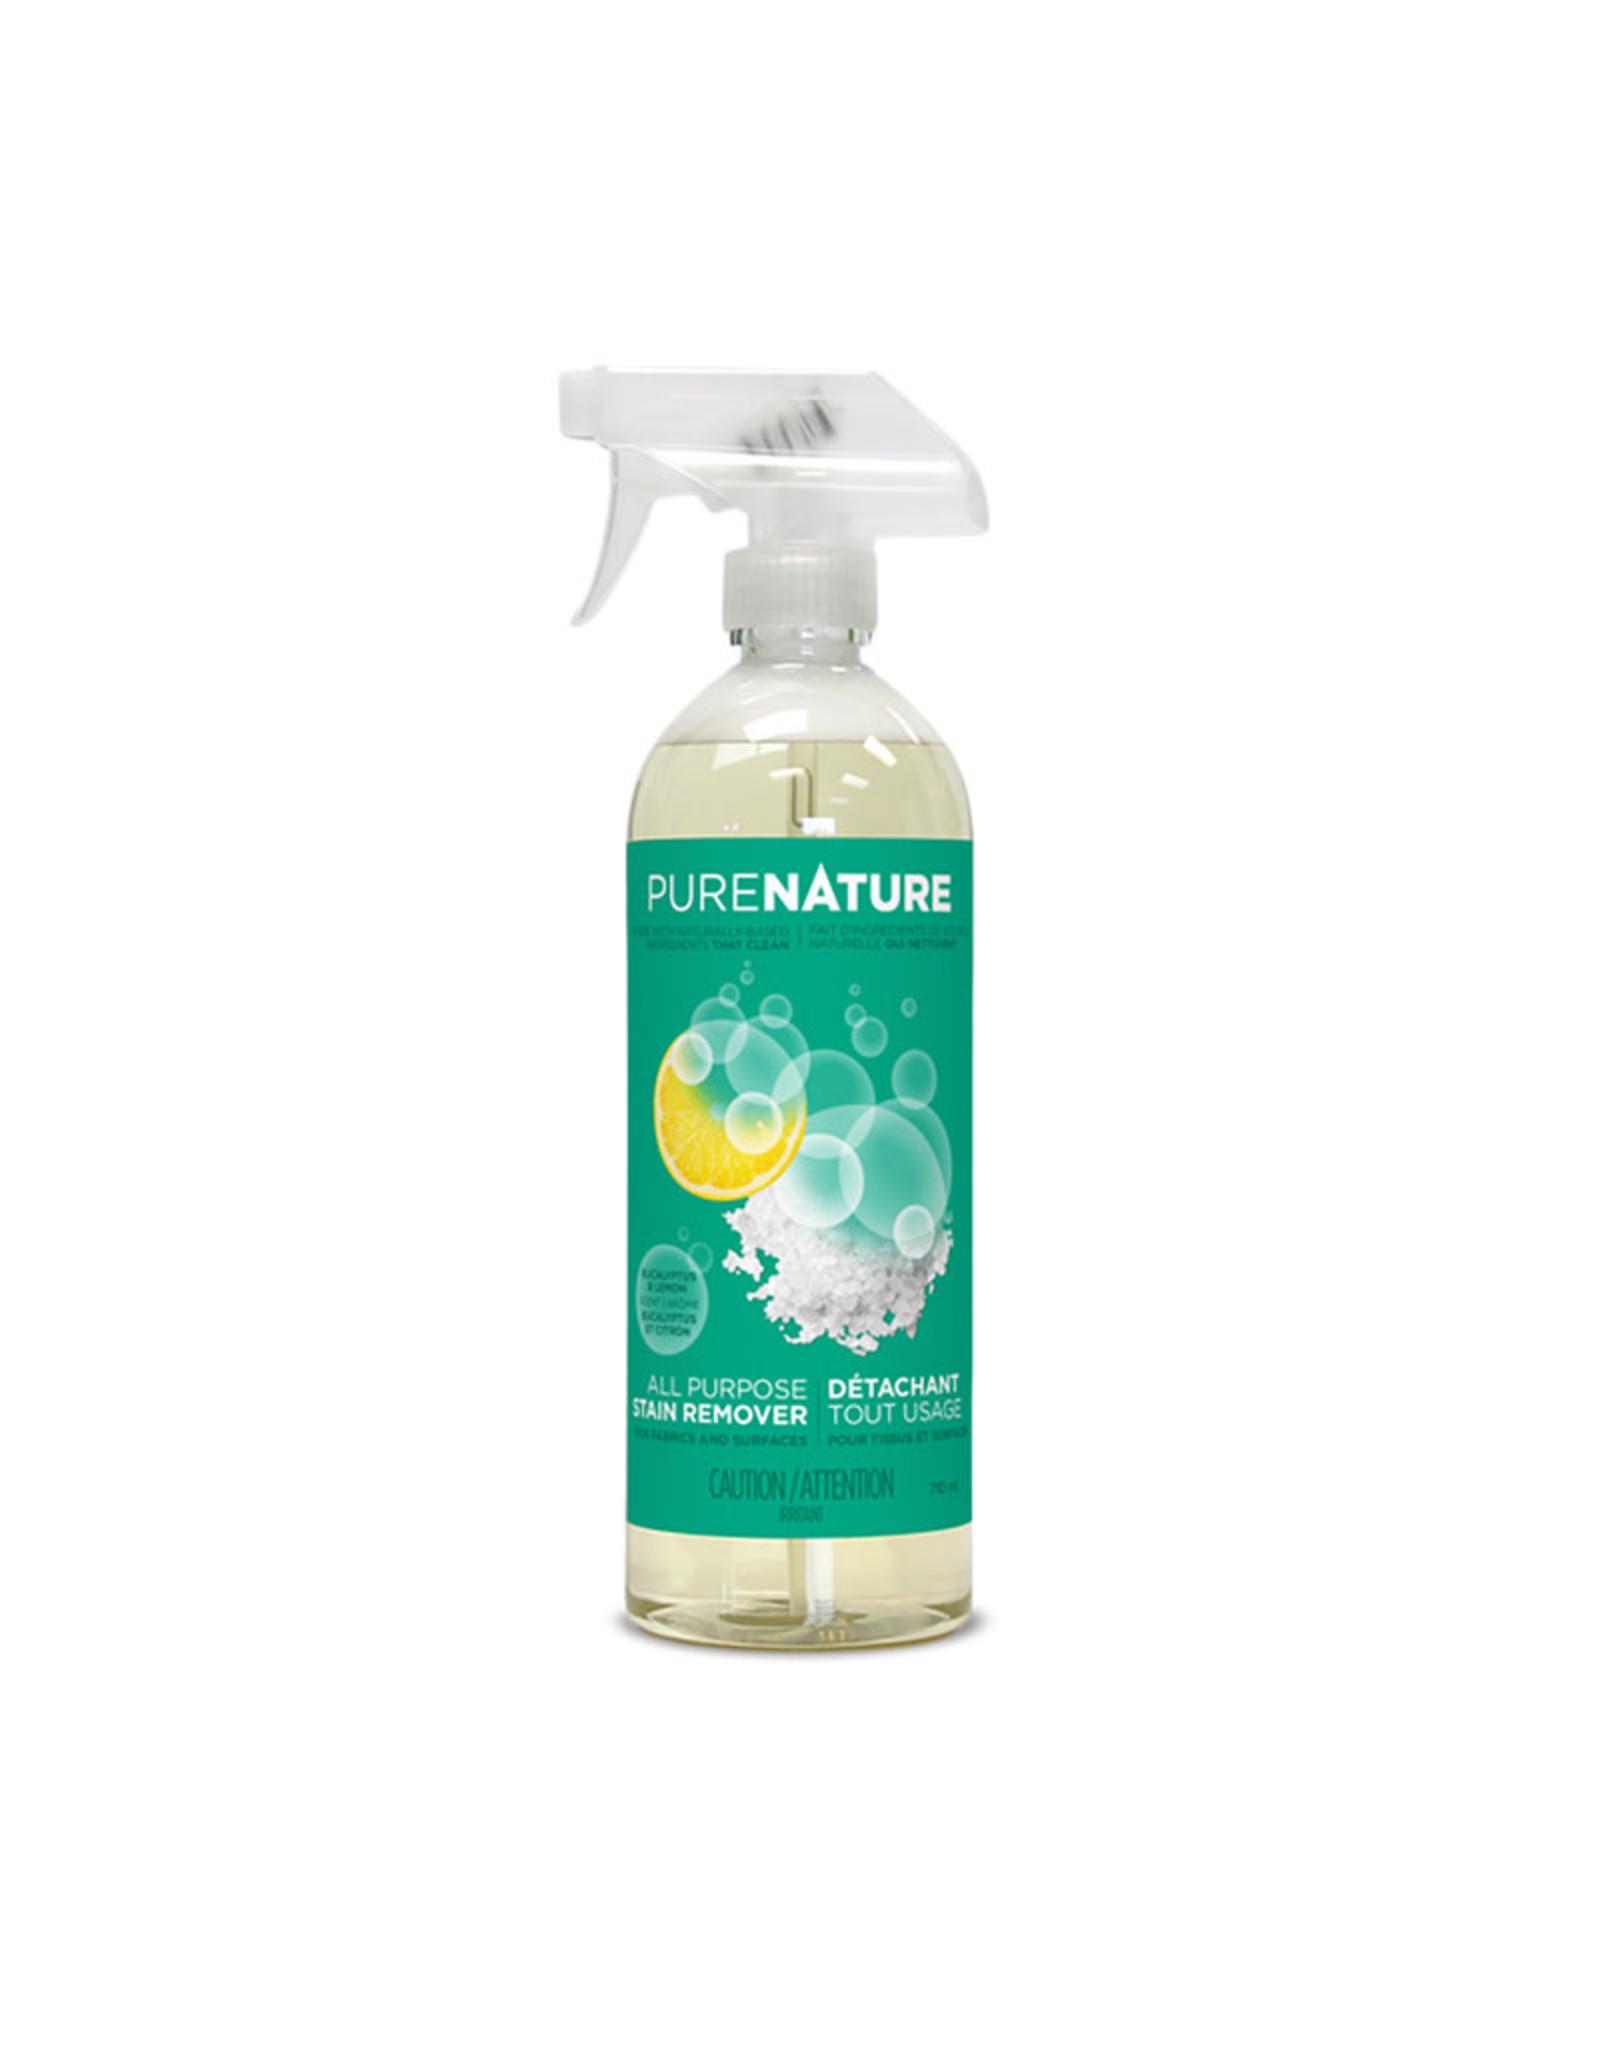 Purenature Purenature - Cleaners, Stain Remover (710ml)